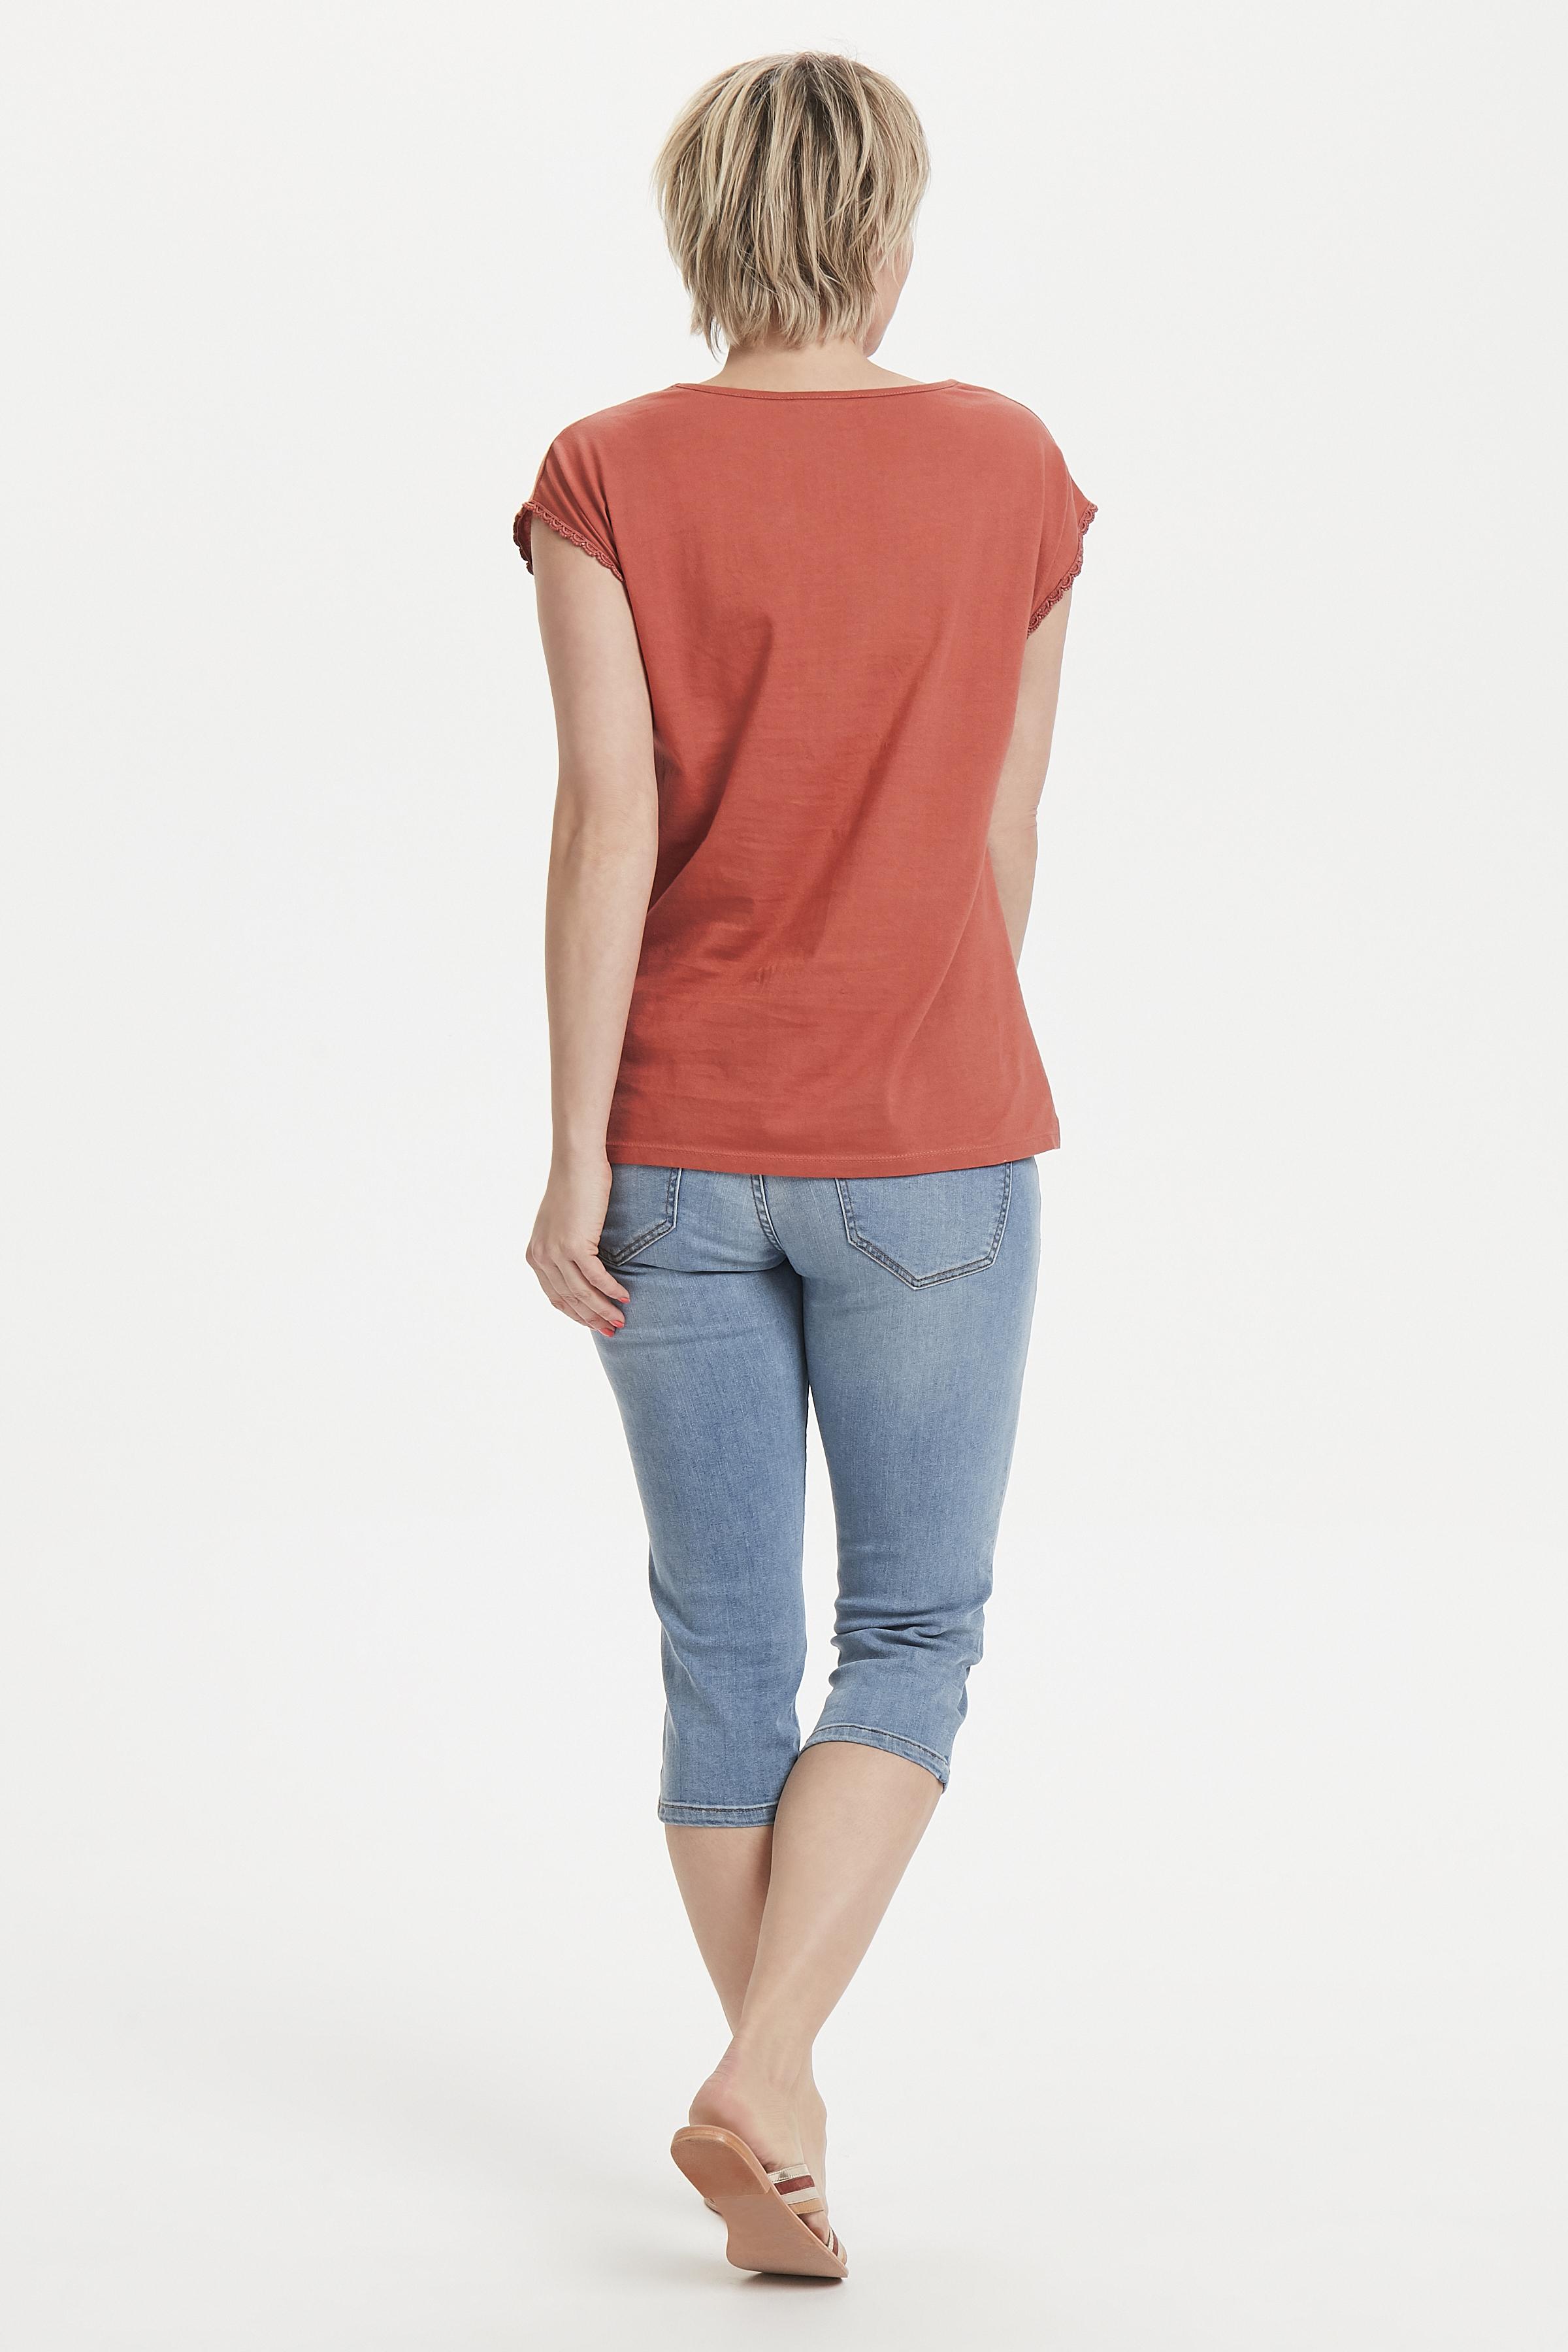 Gebranntes rot Kurzarm-Shirt von Bon'A Parte – Shoppen Sie Gebranntes rot Kurzarm-Shirt ab Gr. S-2XL hier